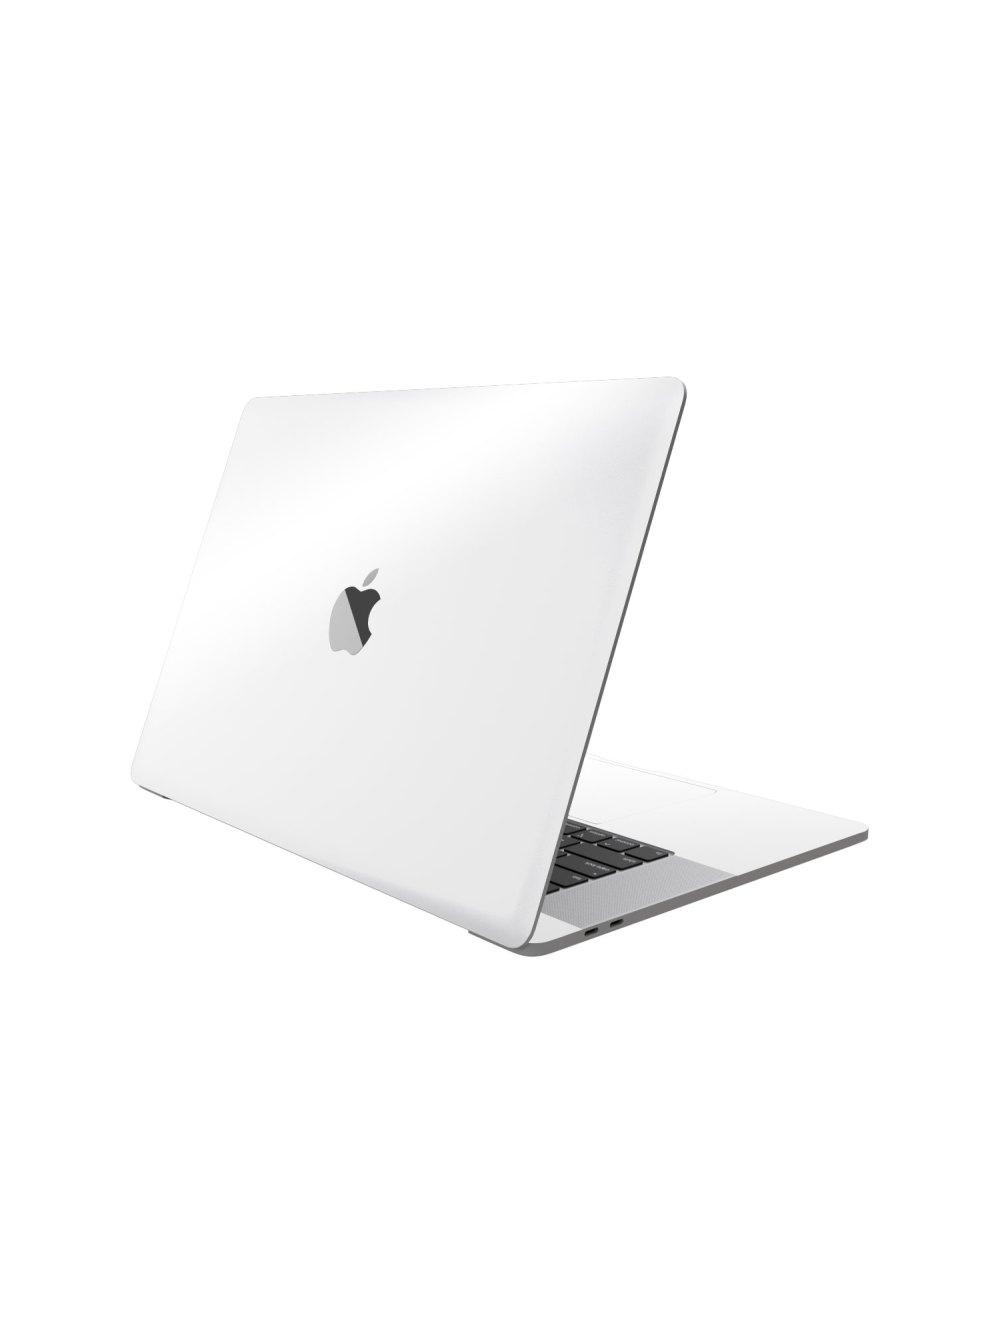 Gloss white Skin Macbook Pro M1 Skin Wrap Cover